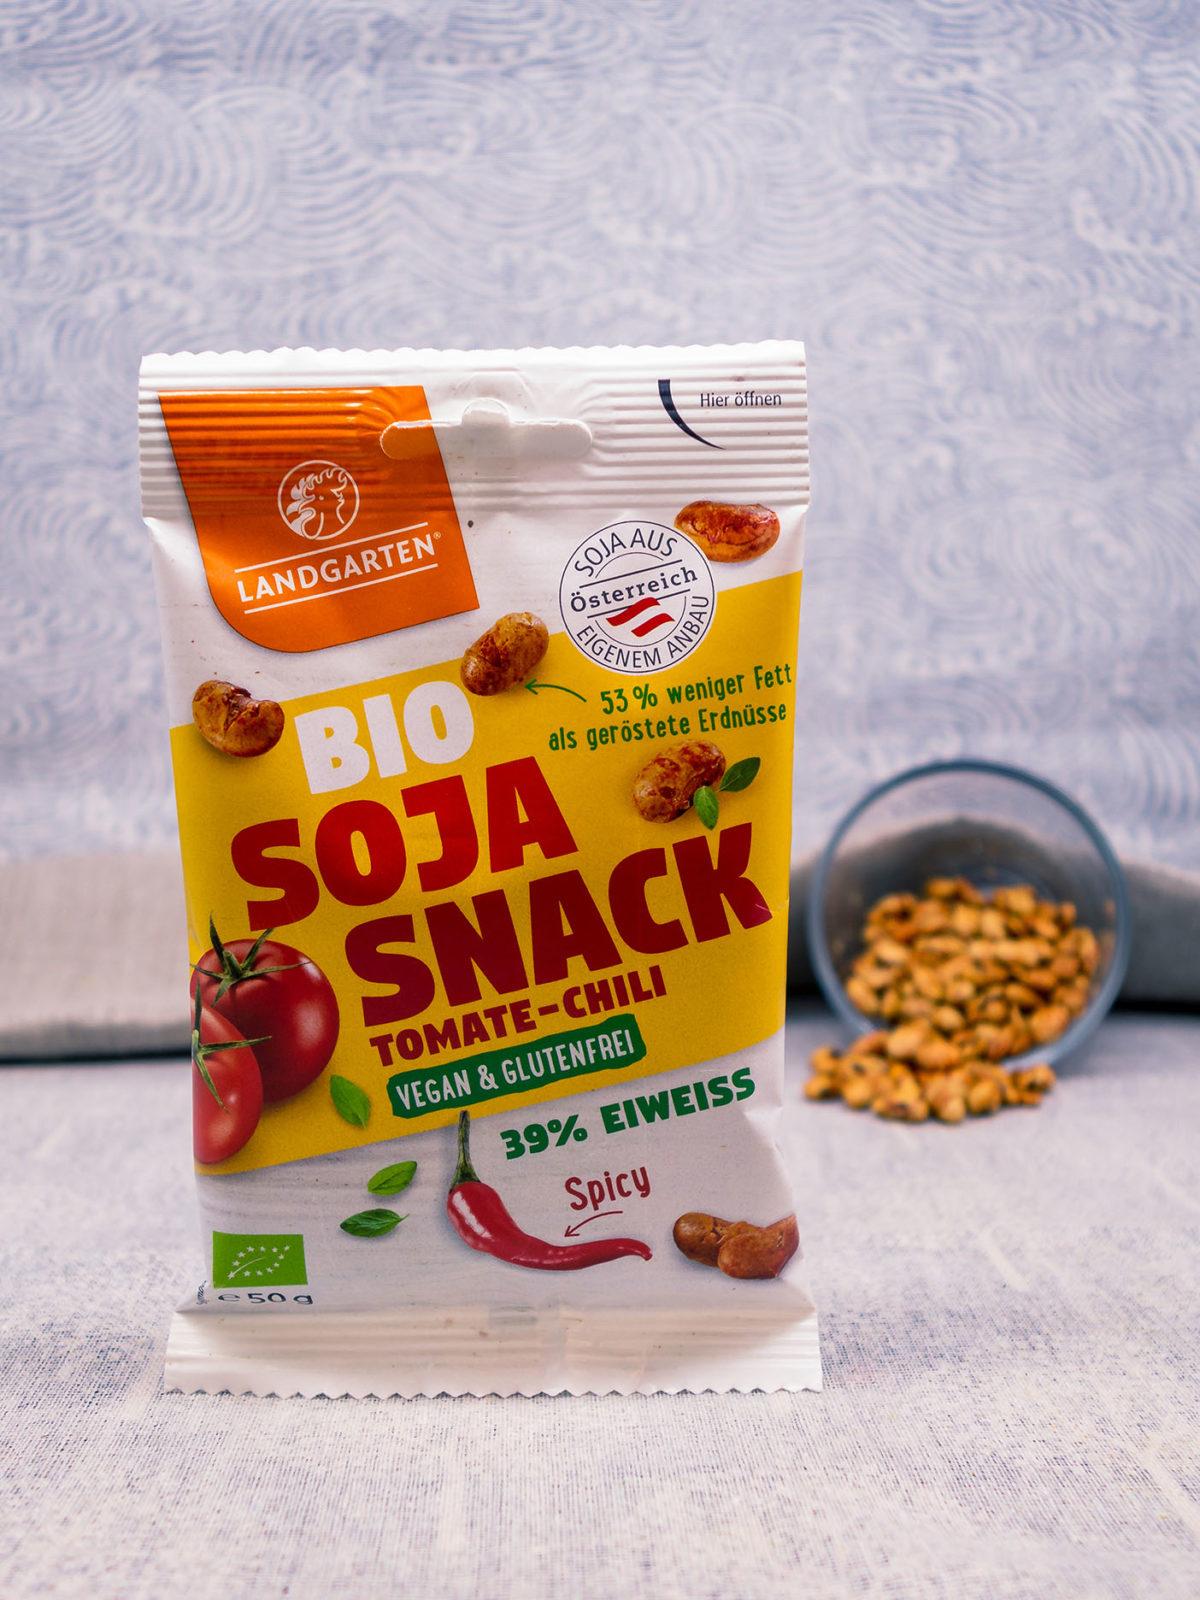 Soja Snack_Tomate-Chili